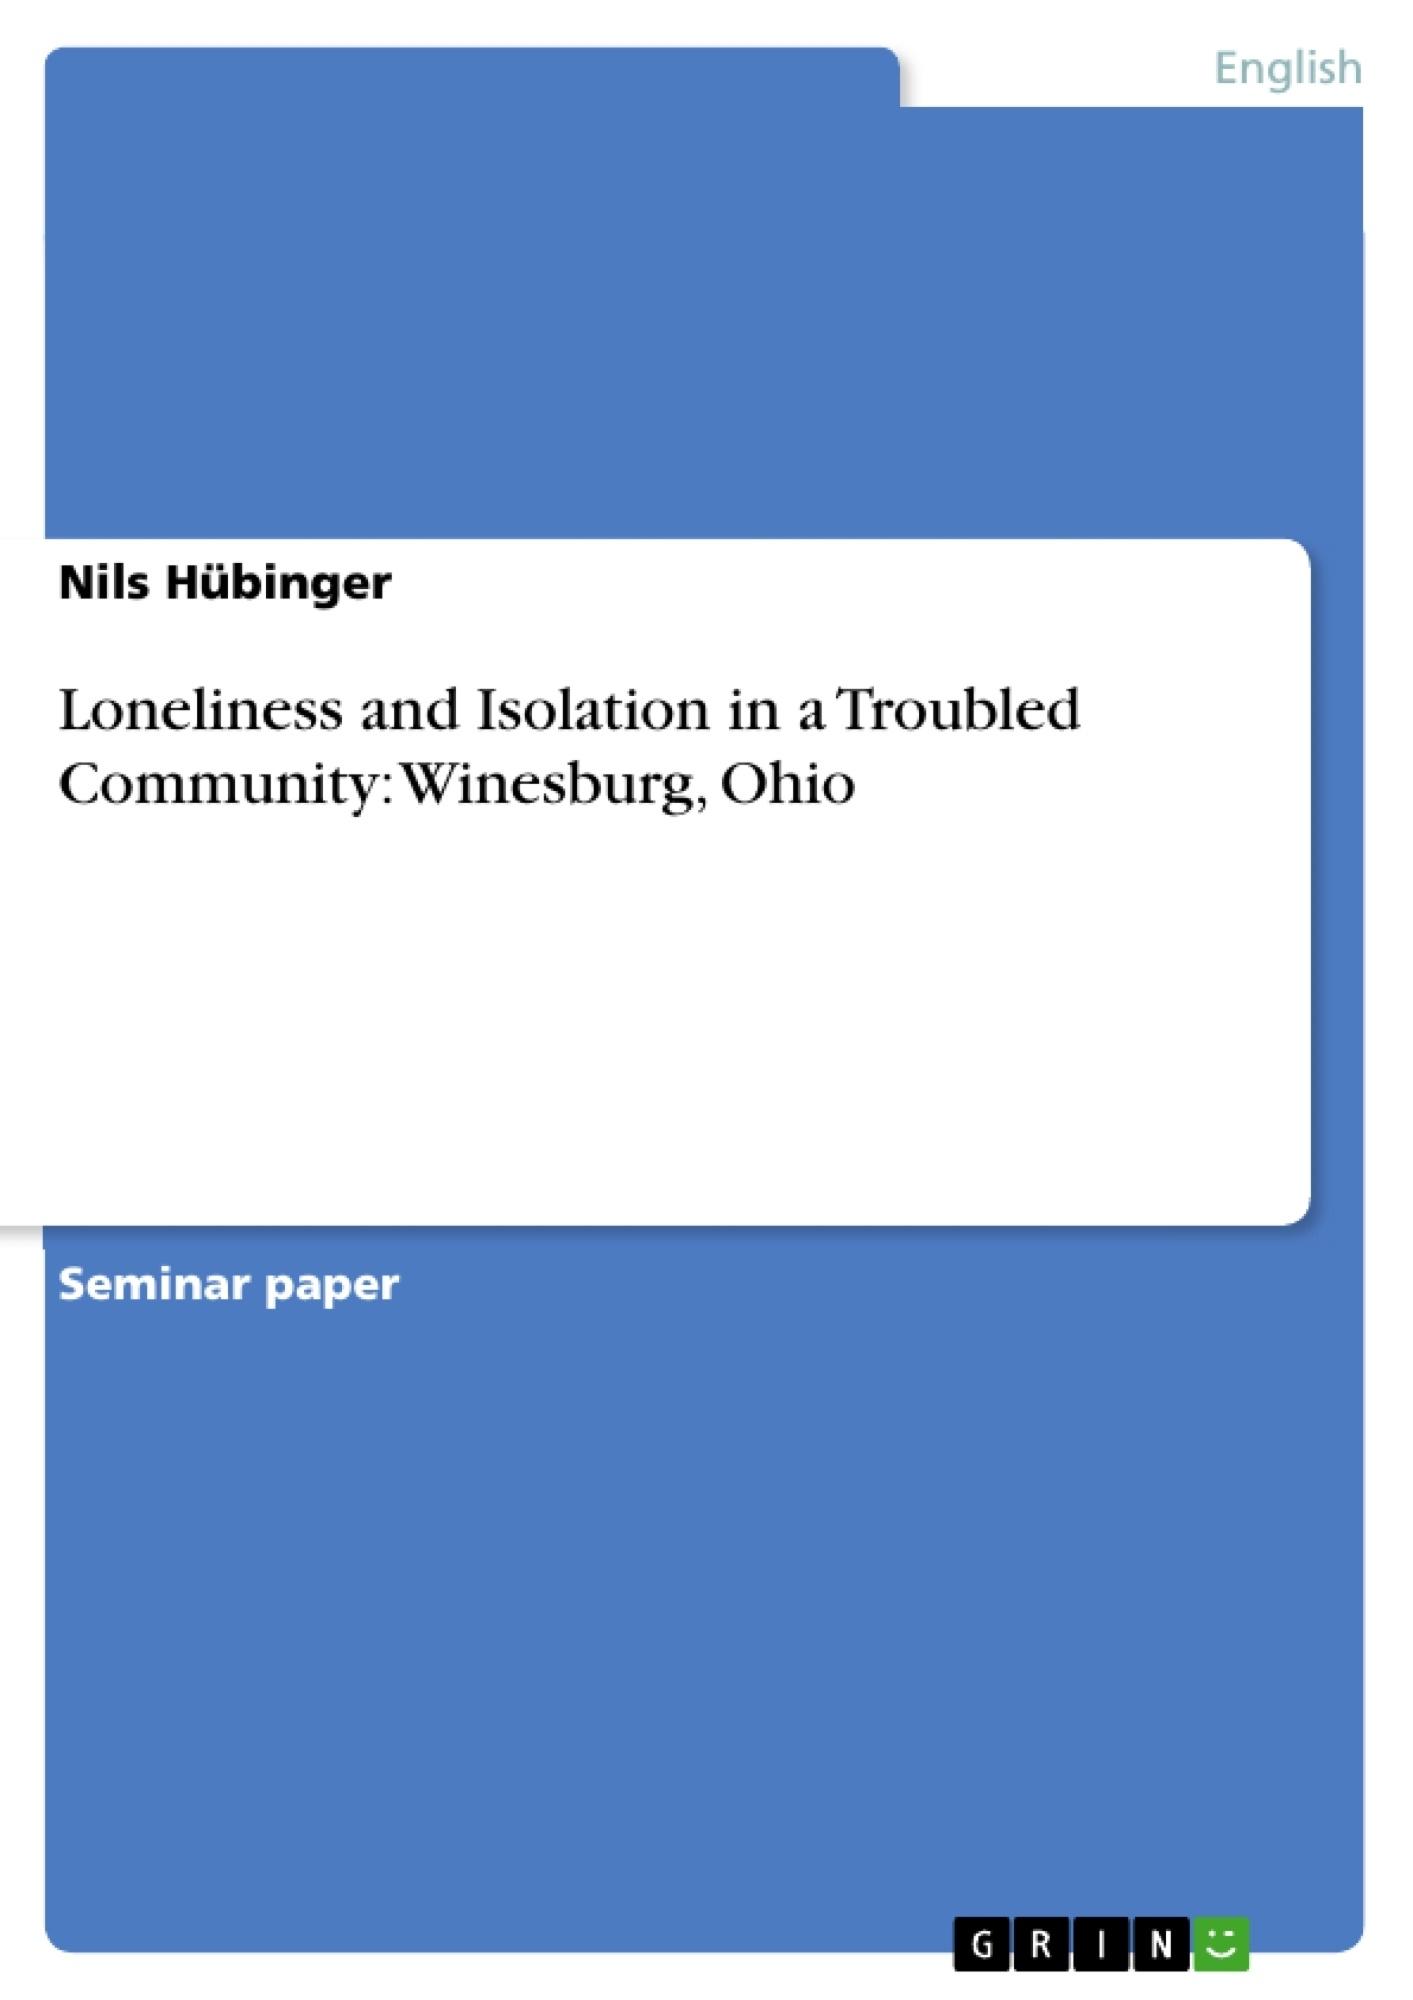 winesburg ohio thesis statements